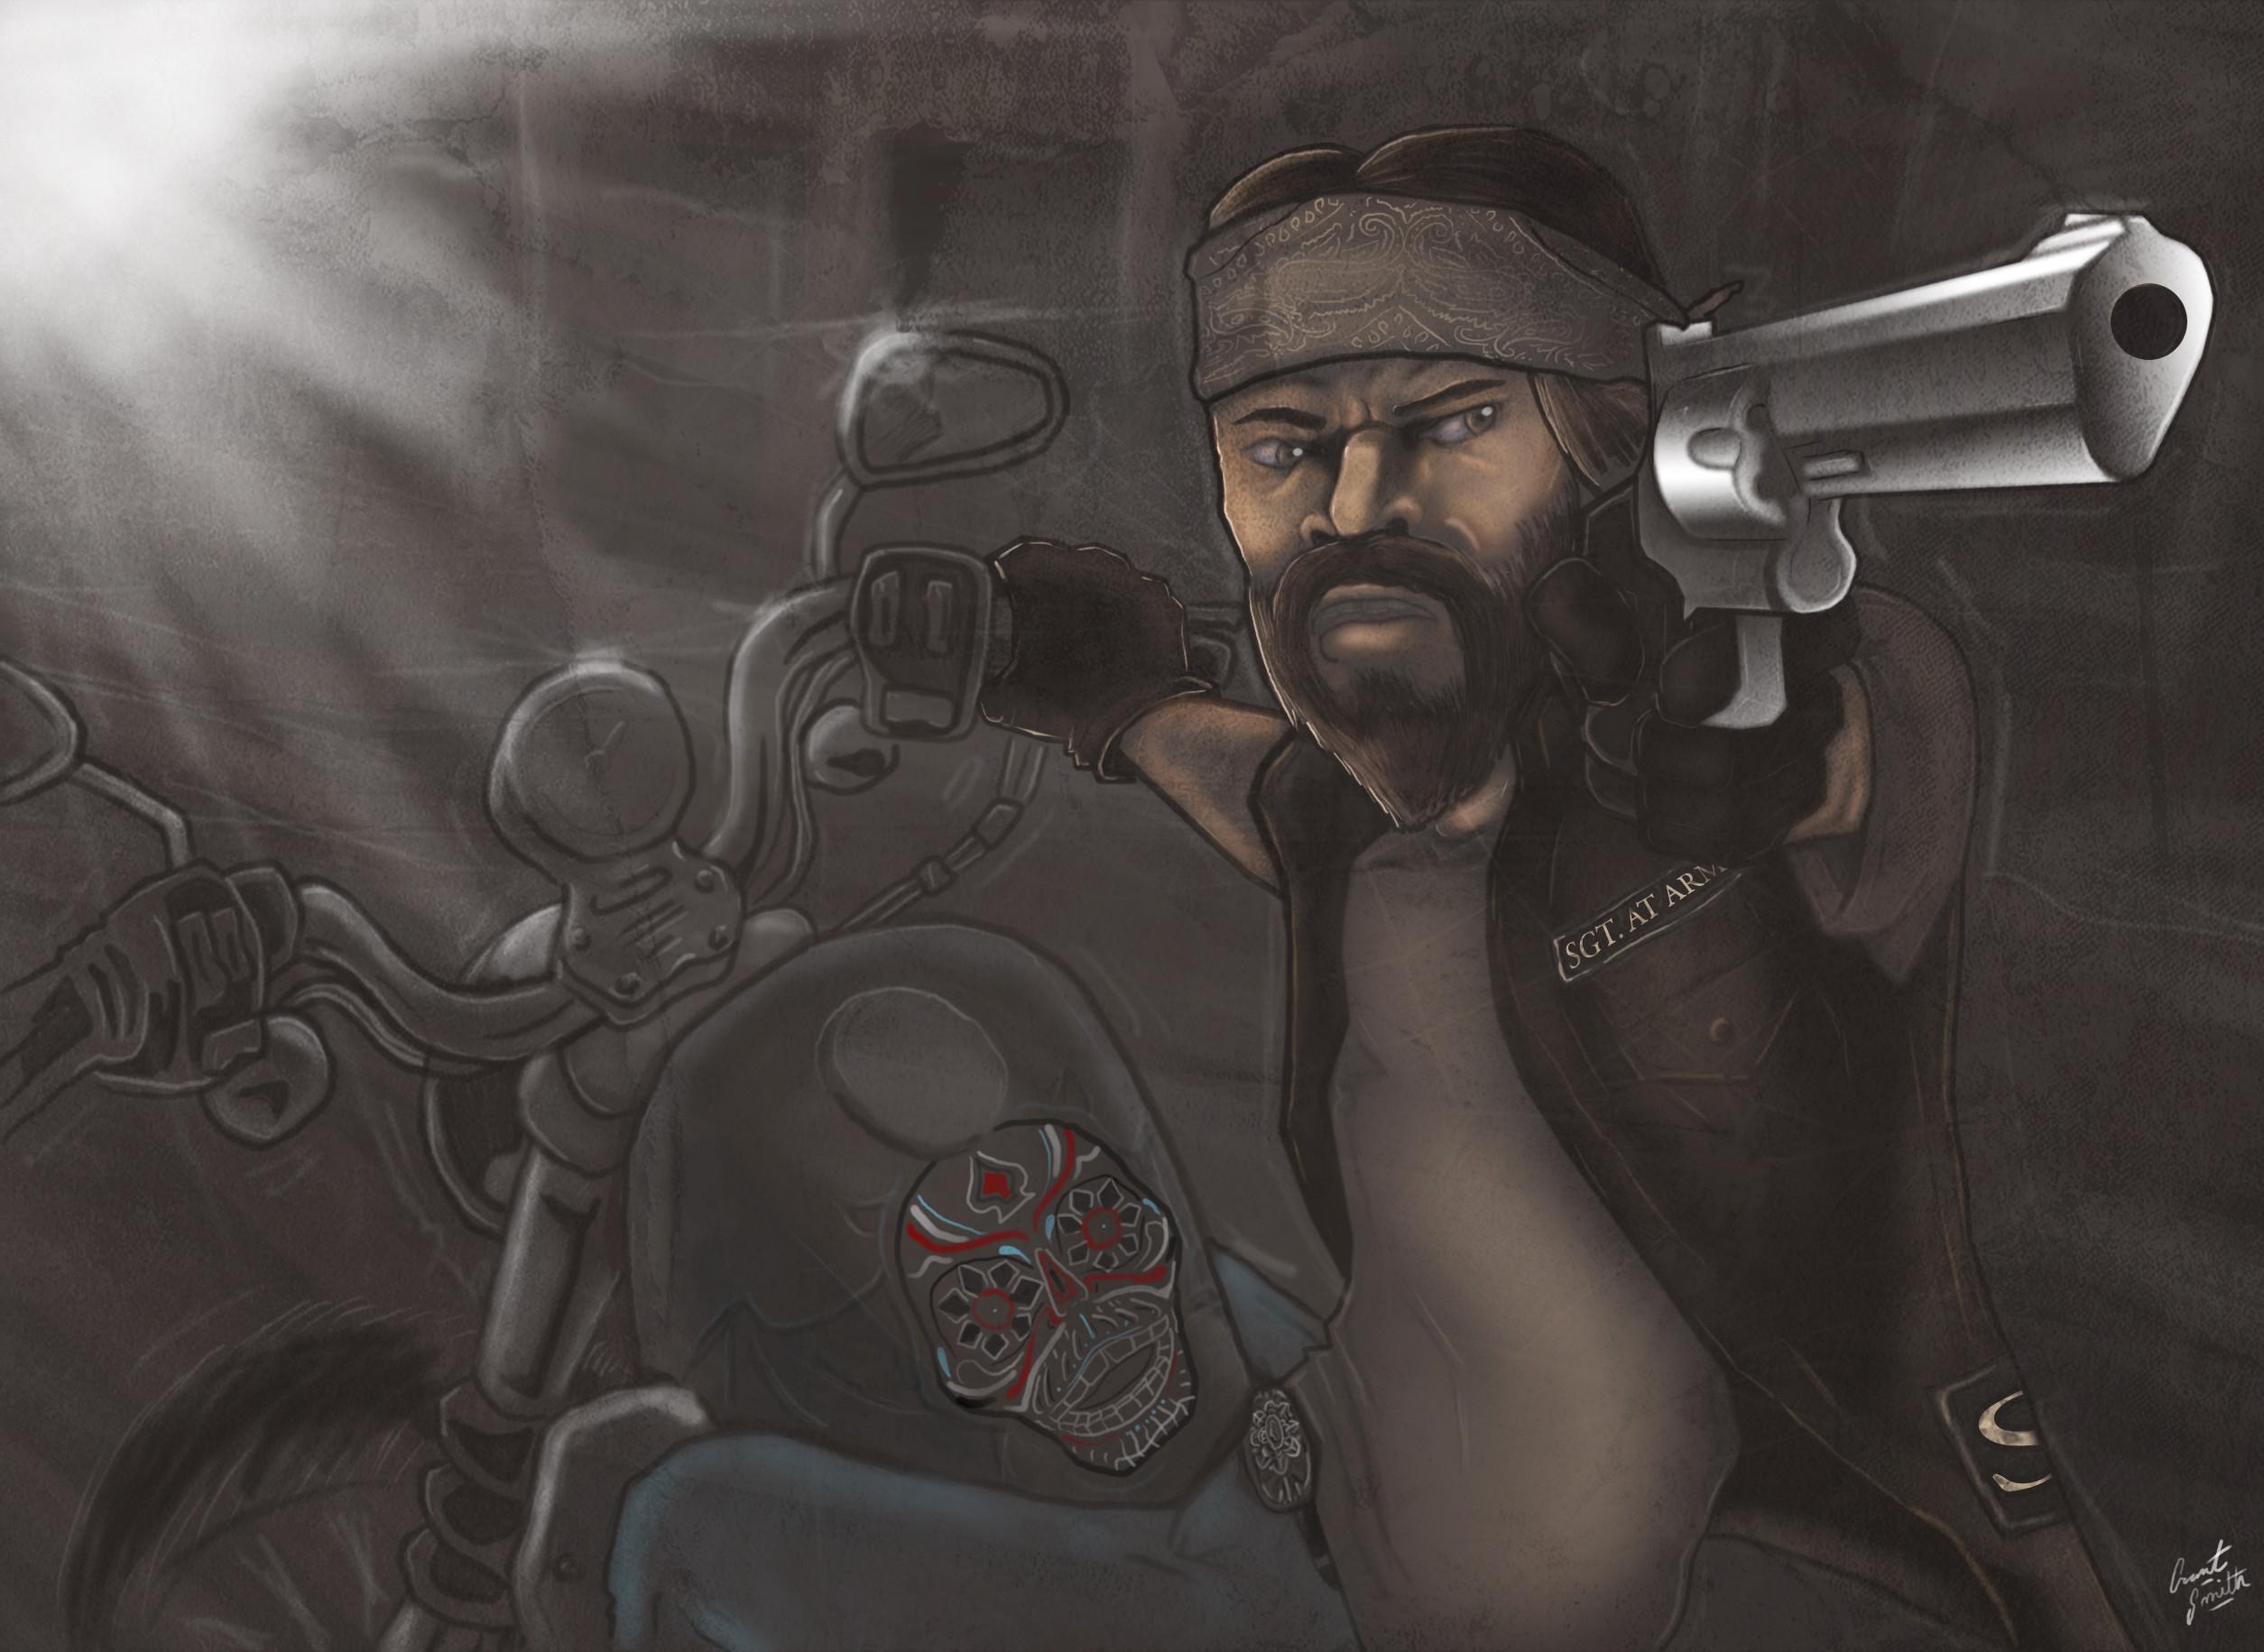 Outlaw Biker Digital Painting | theartofgronith